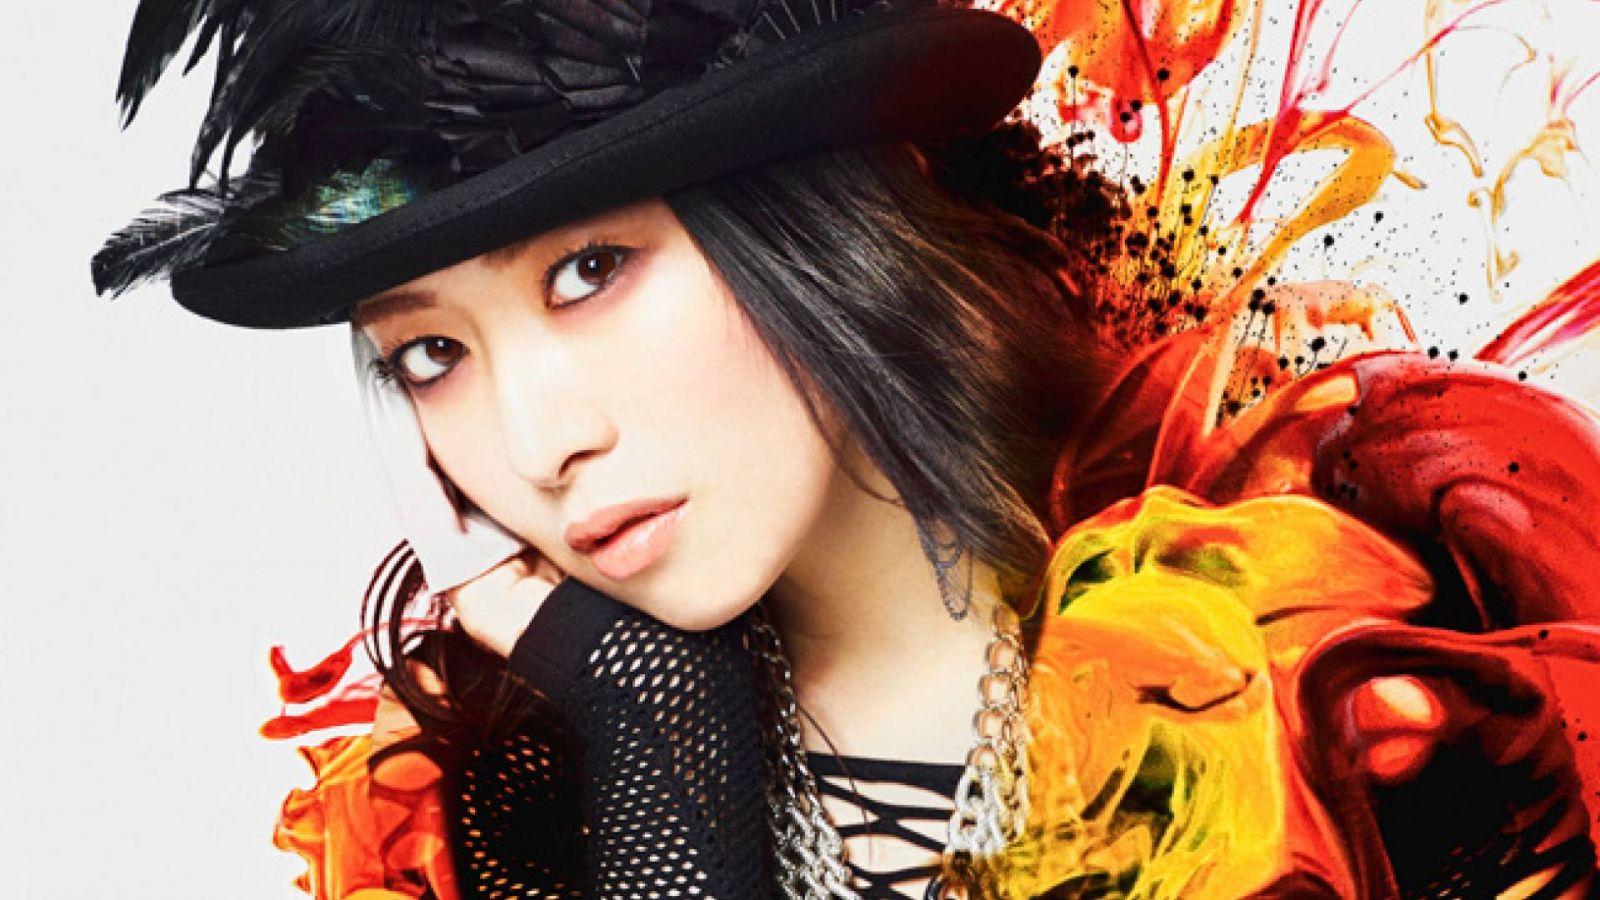 Minori Chihara © Linkarts Inc. All rights reserved.